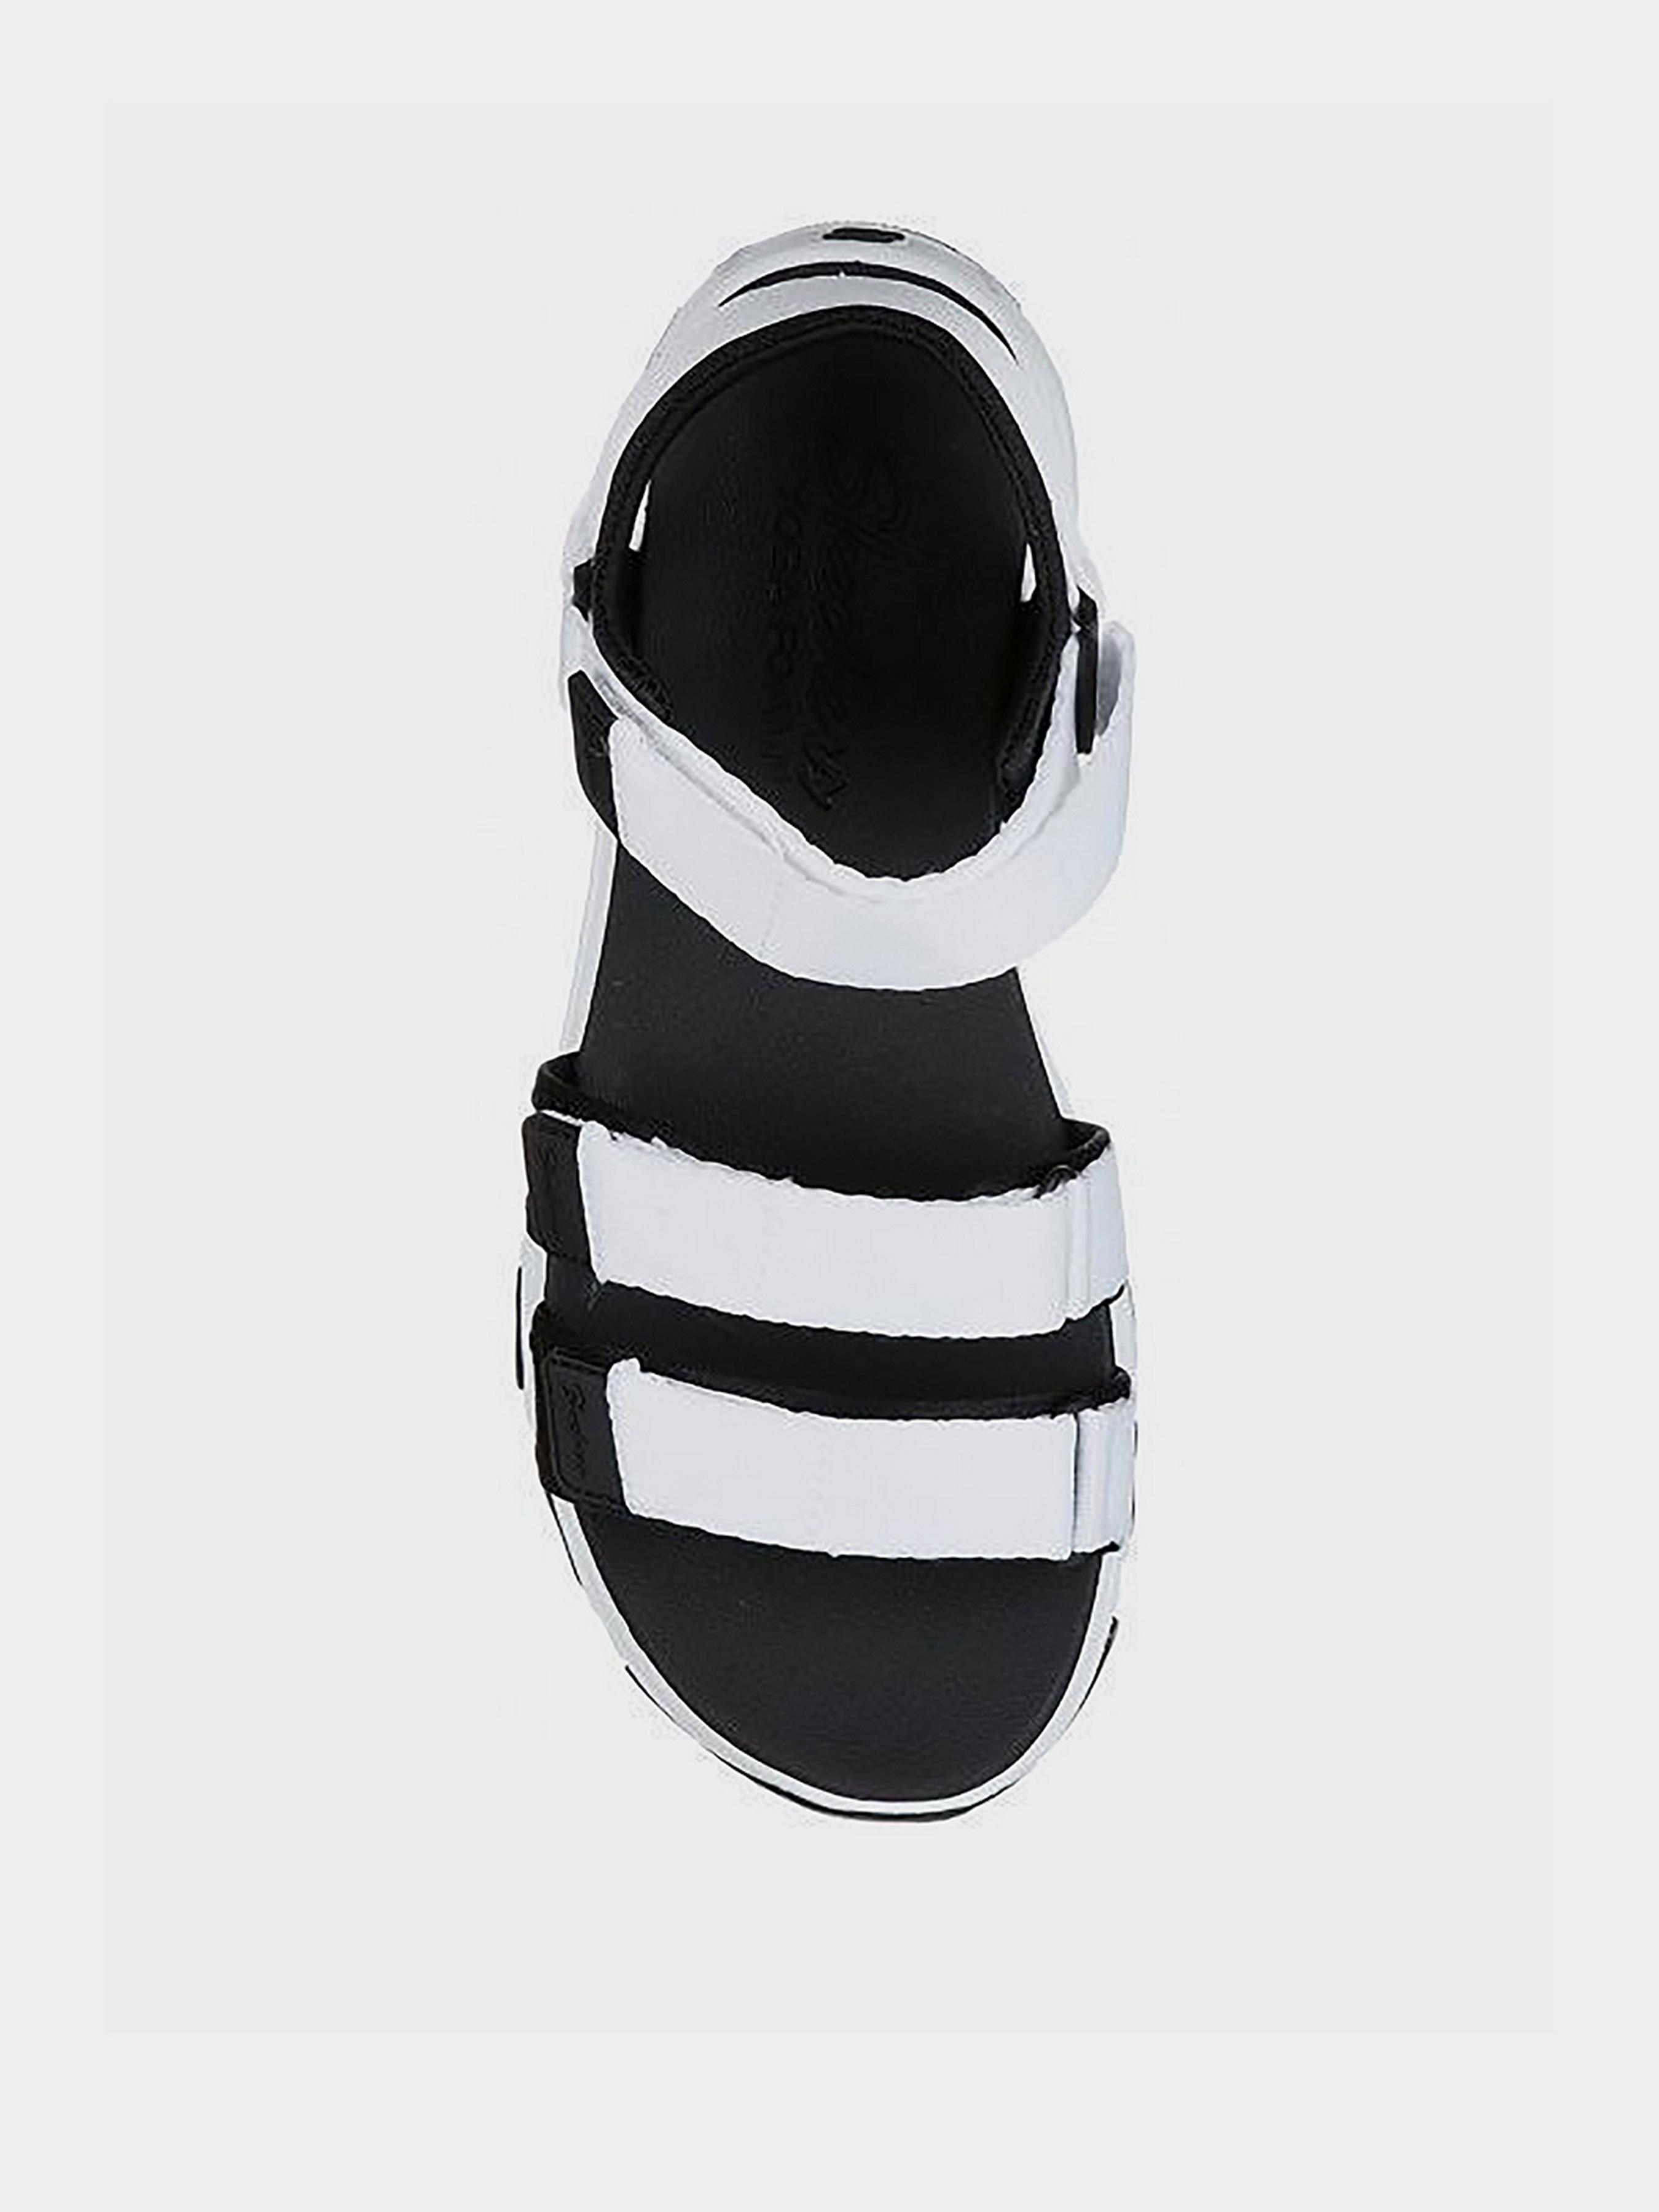 Сандалии для женщин Skechers KW5012 , 2017